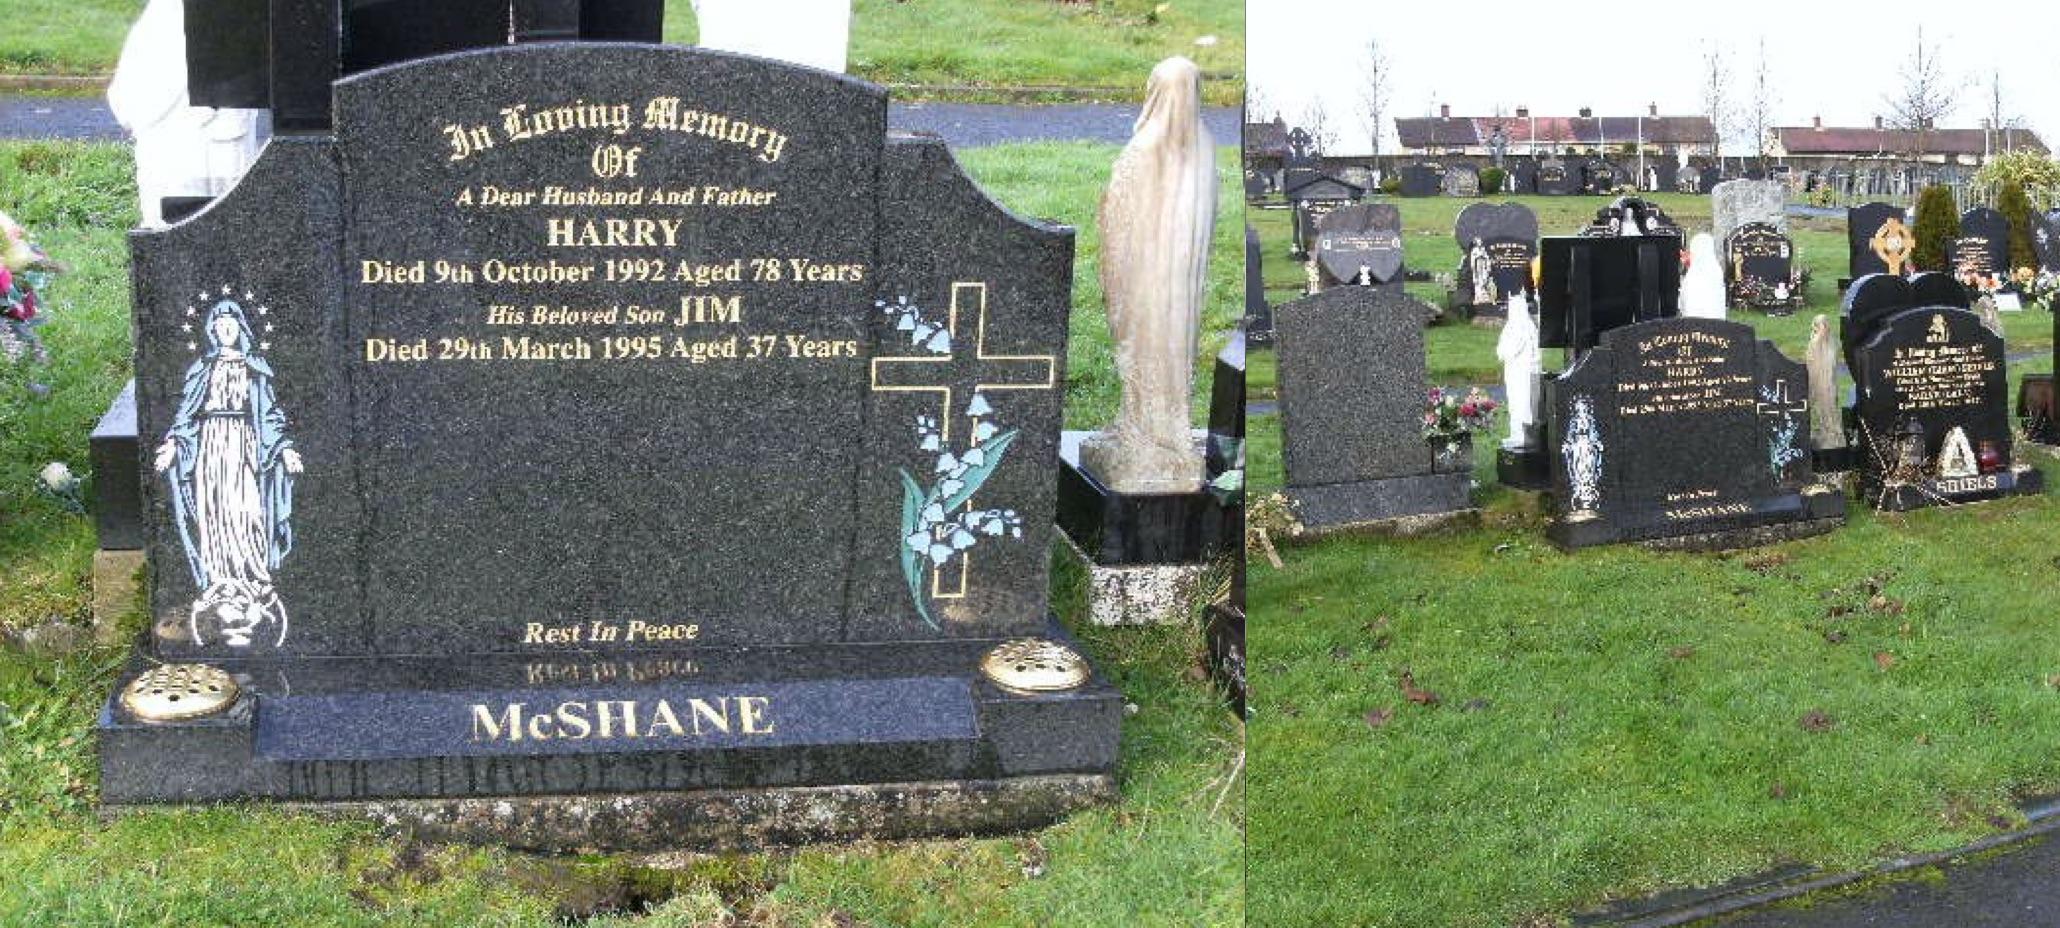 Tumba de Jimmy McShane en Londonderry (Irlanda del Norte).